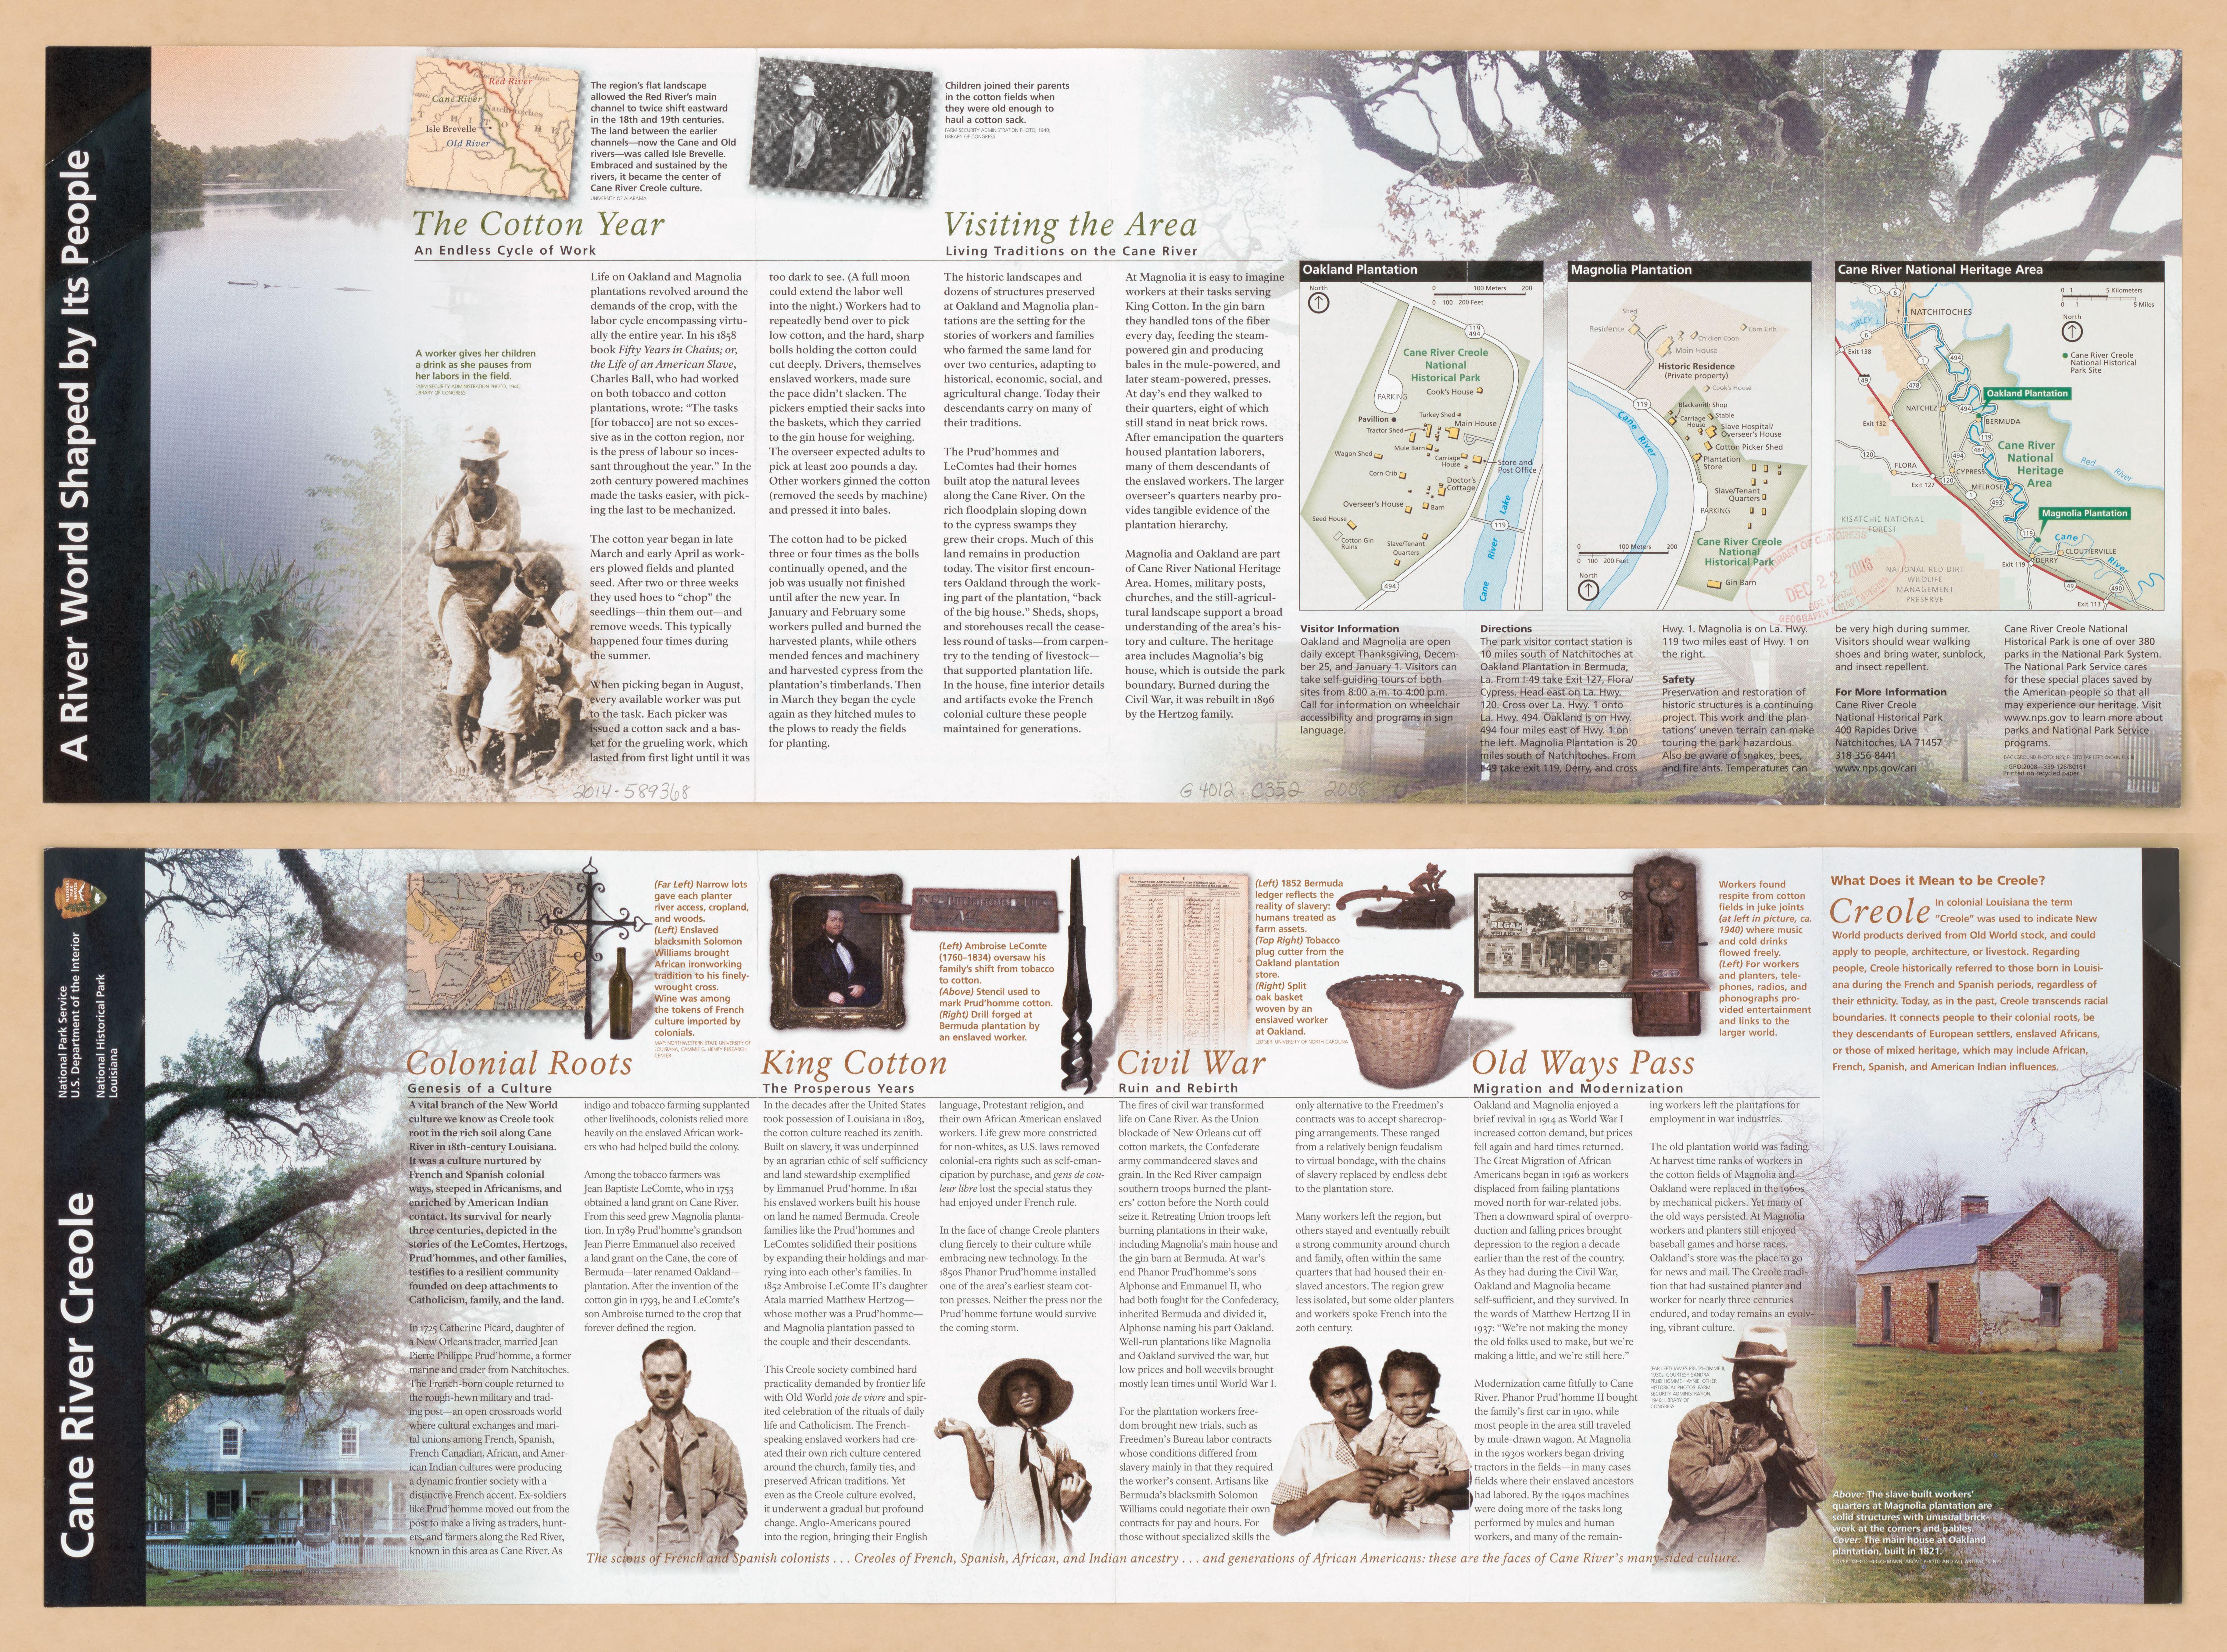 cane river louisiana map File Cane River Creole National Historical Park Louisiana Loc cane river louisiana map